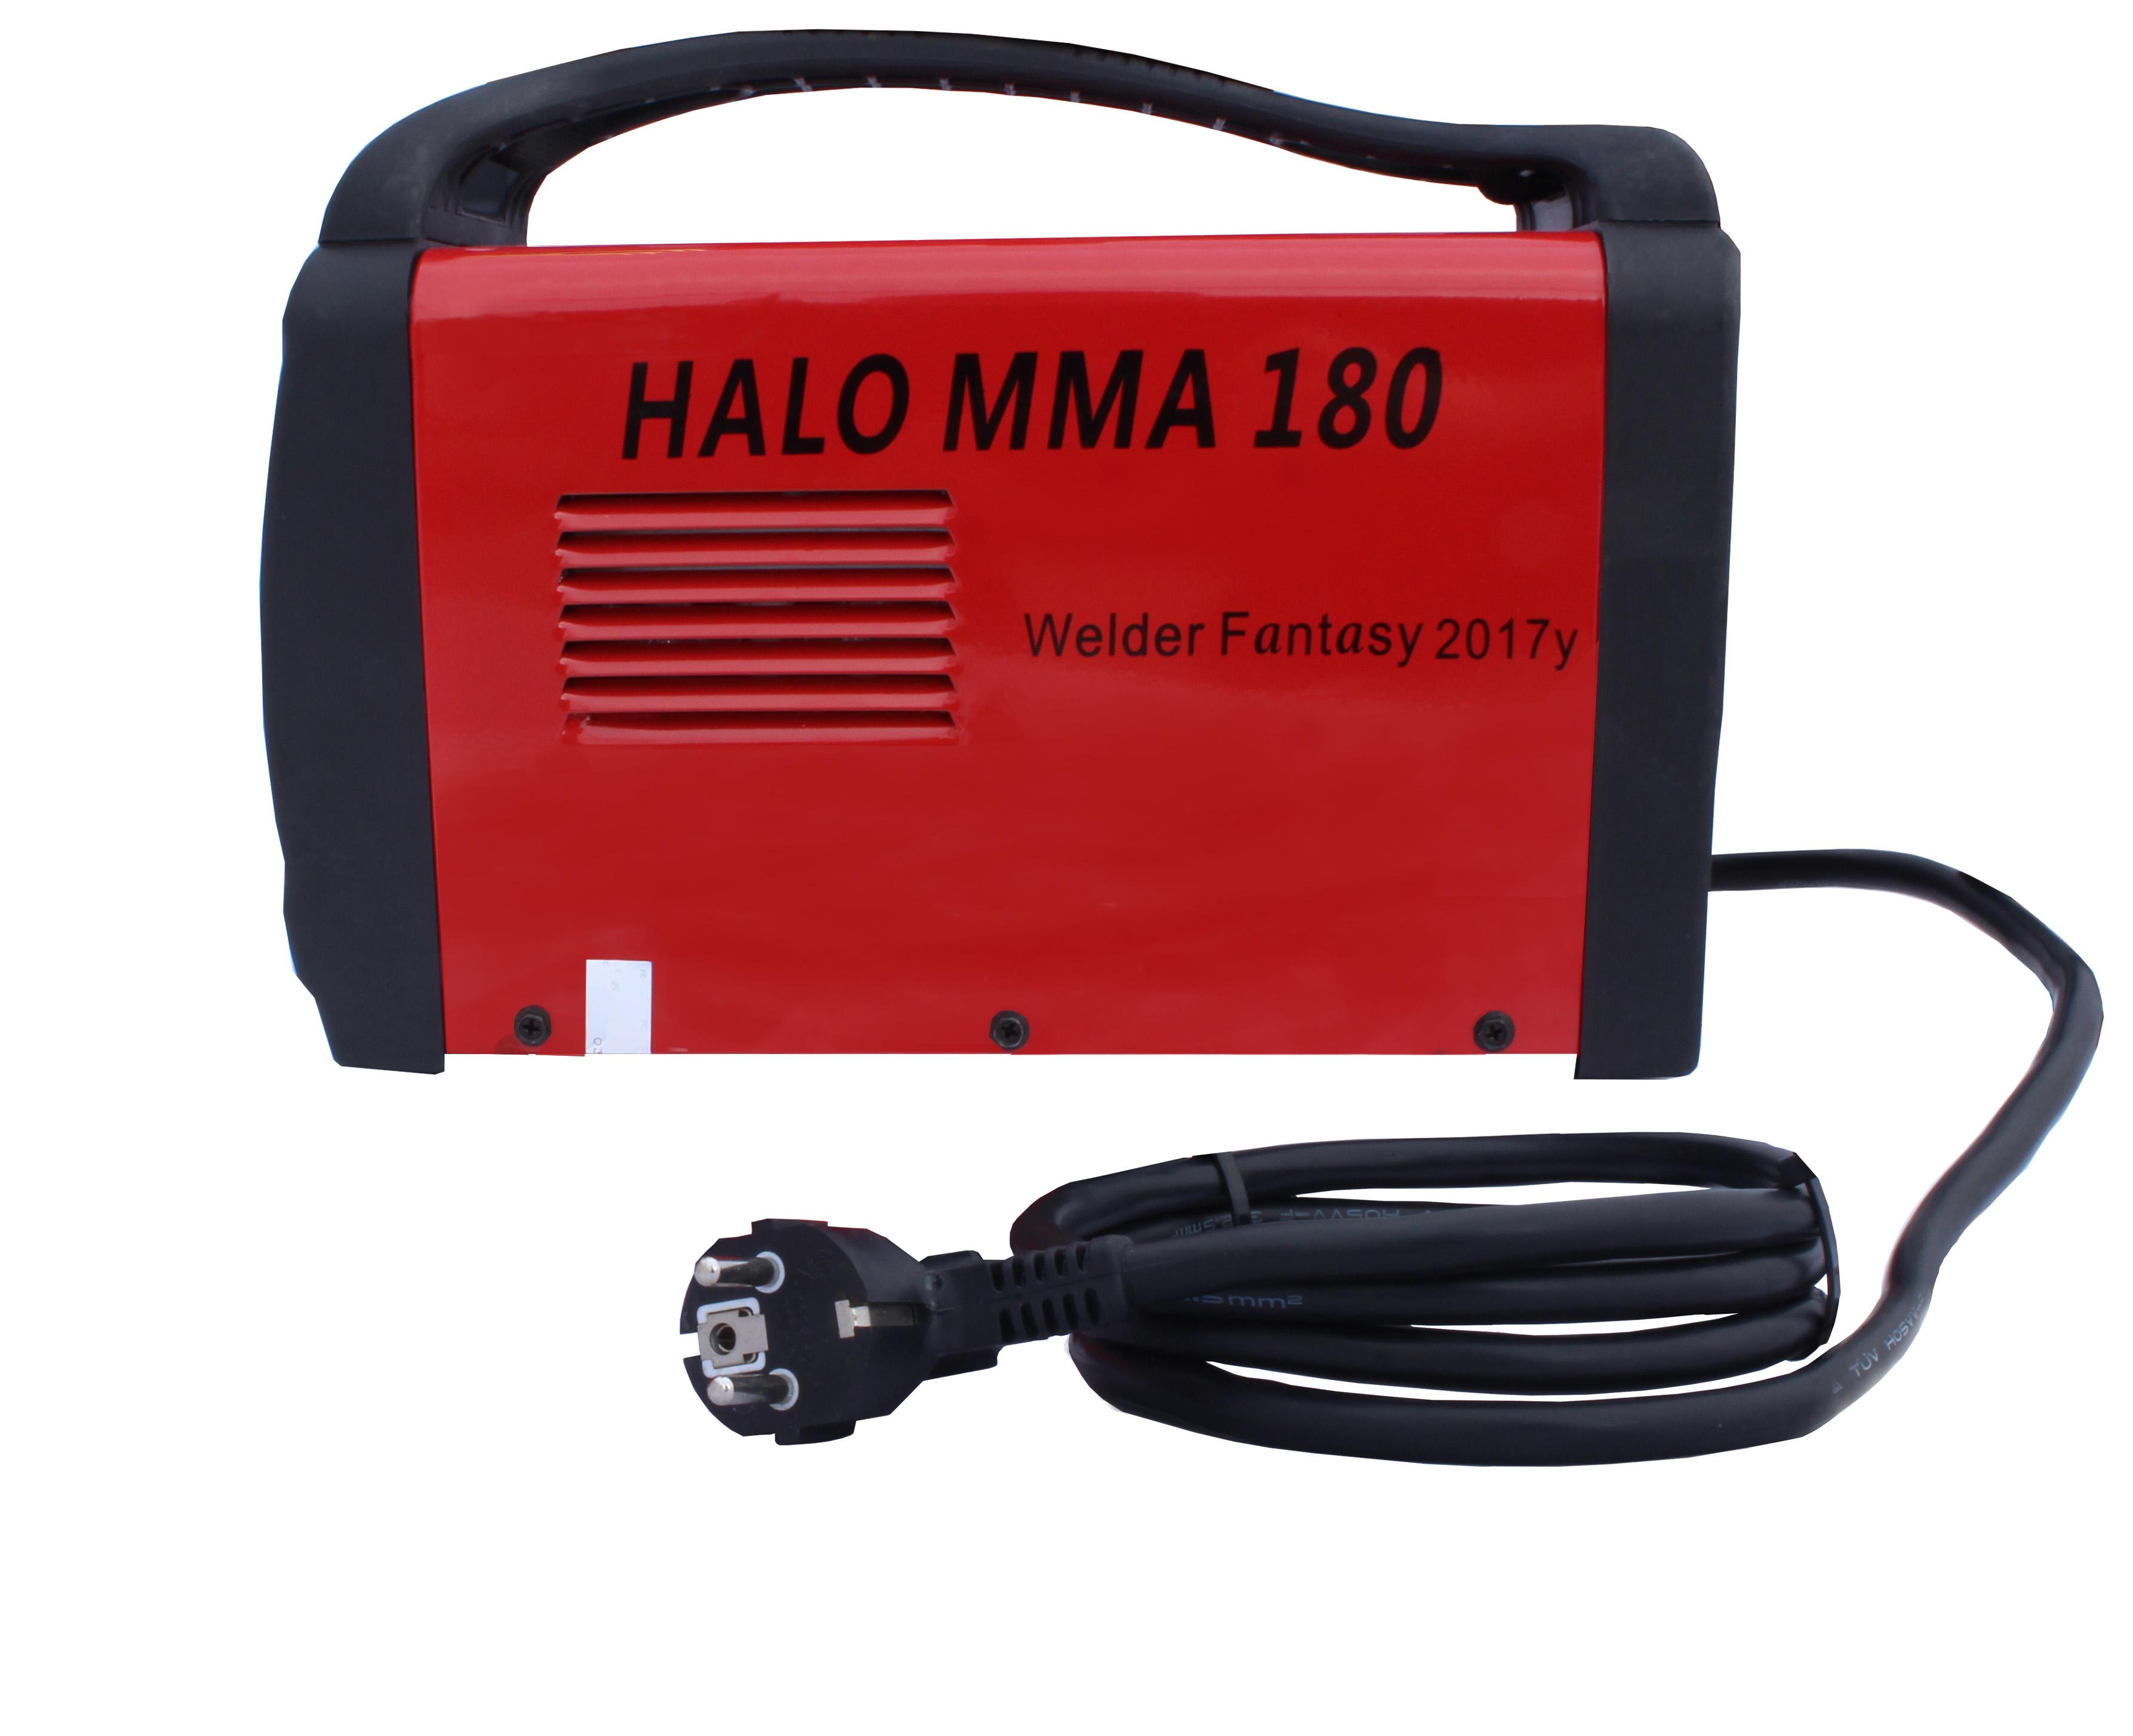 Spawarka inwerterowa HALO MMA180A Welder Fantasy